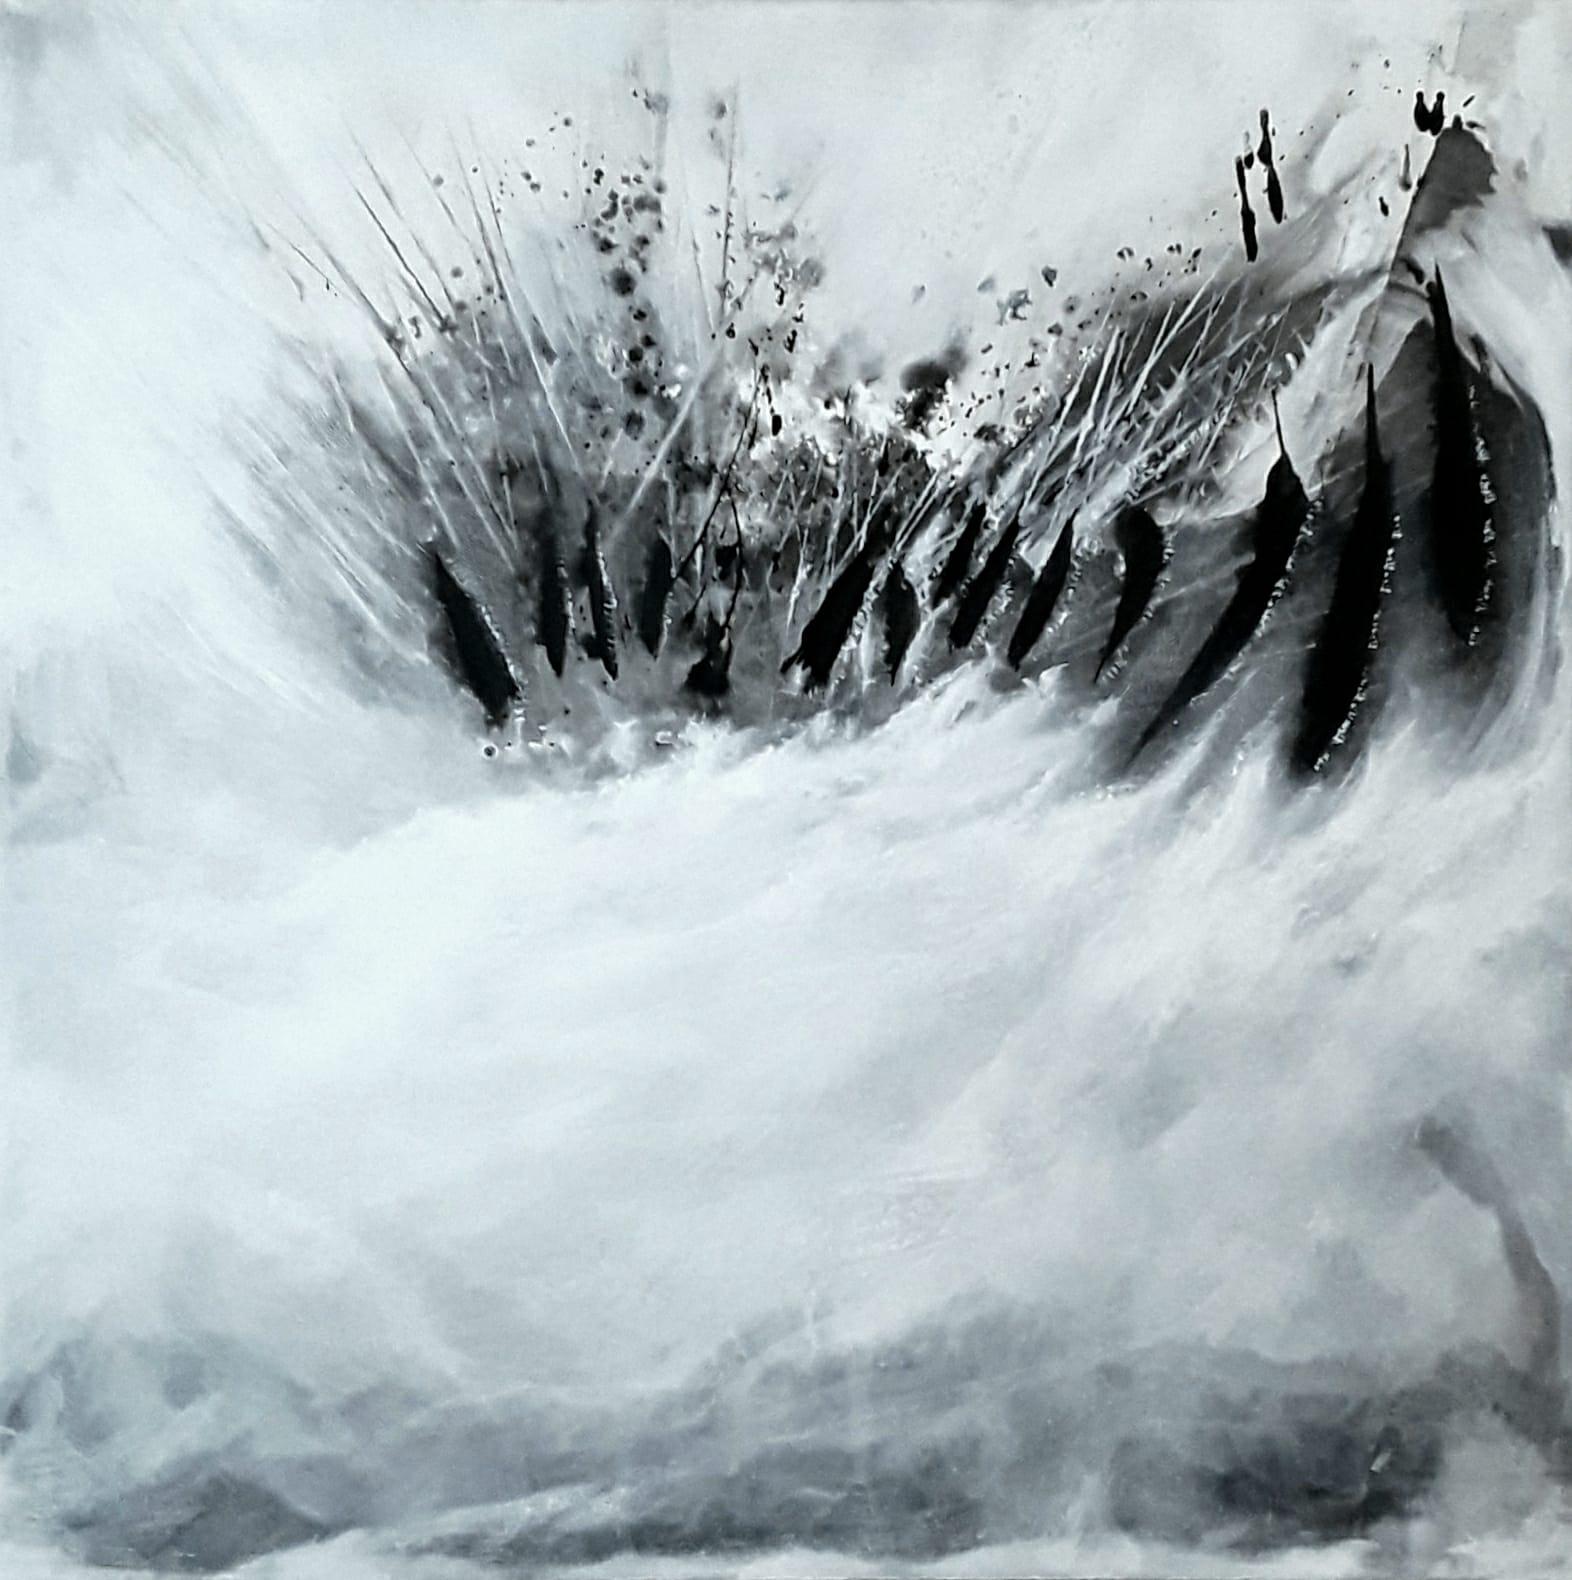 10.12., Acryl-Gemälde von Petroula Papalexandrou, Falkensee, A24